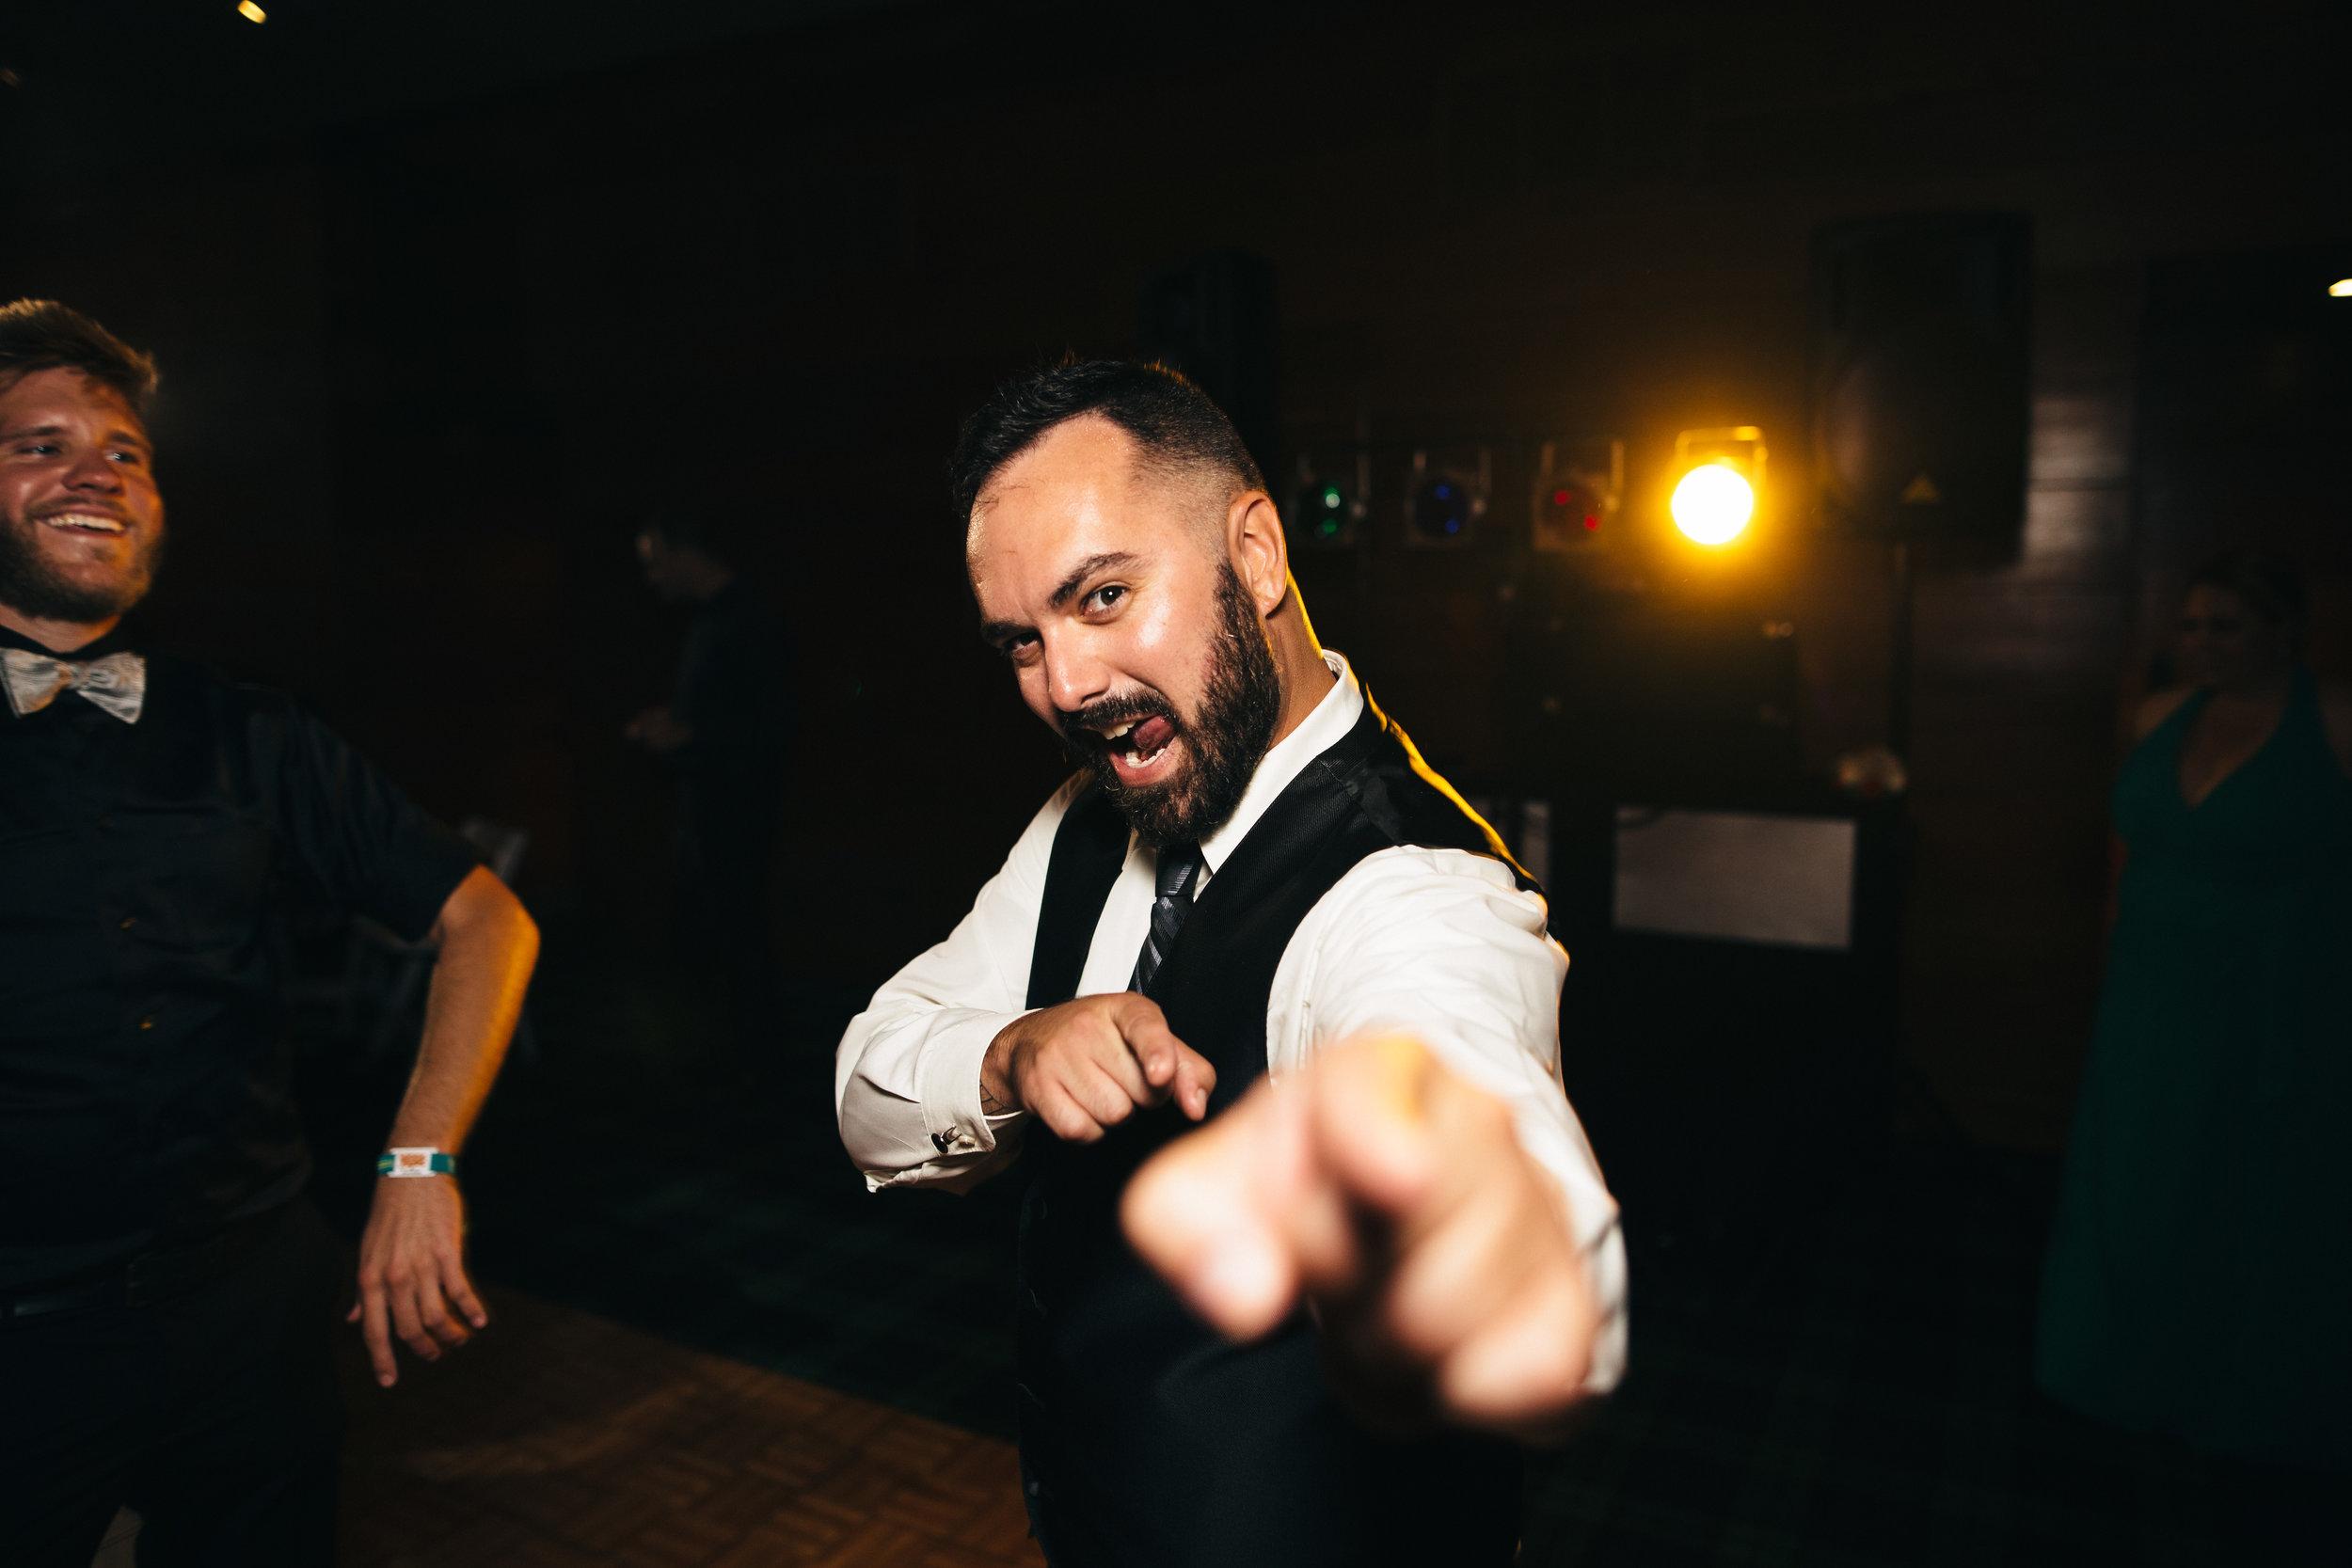 Fun dancing at wedding reception at Walden Inn